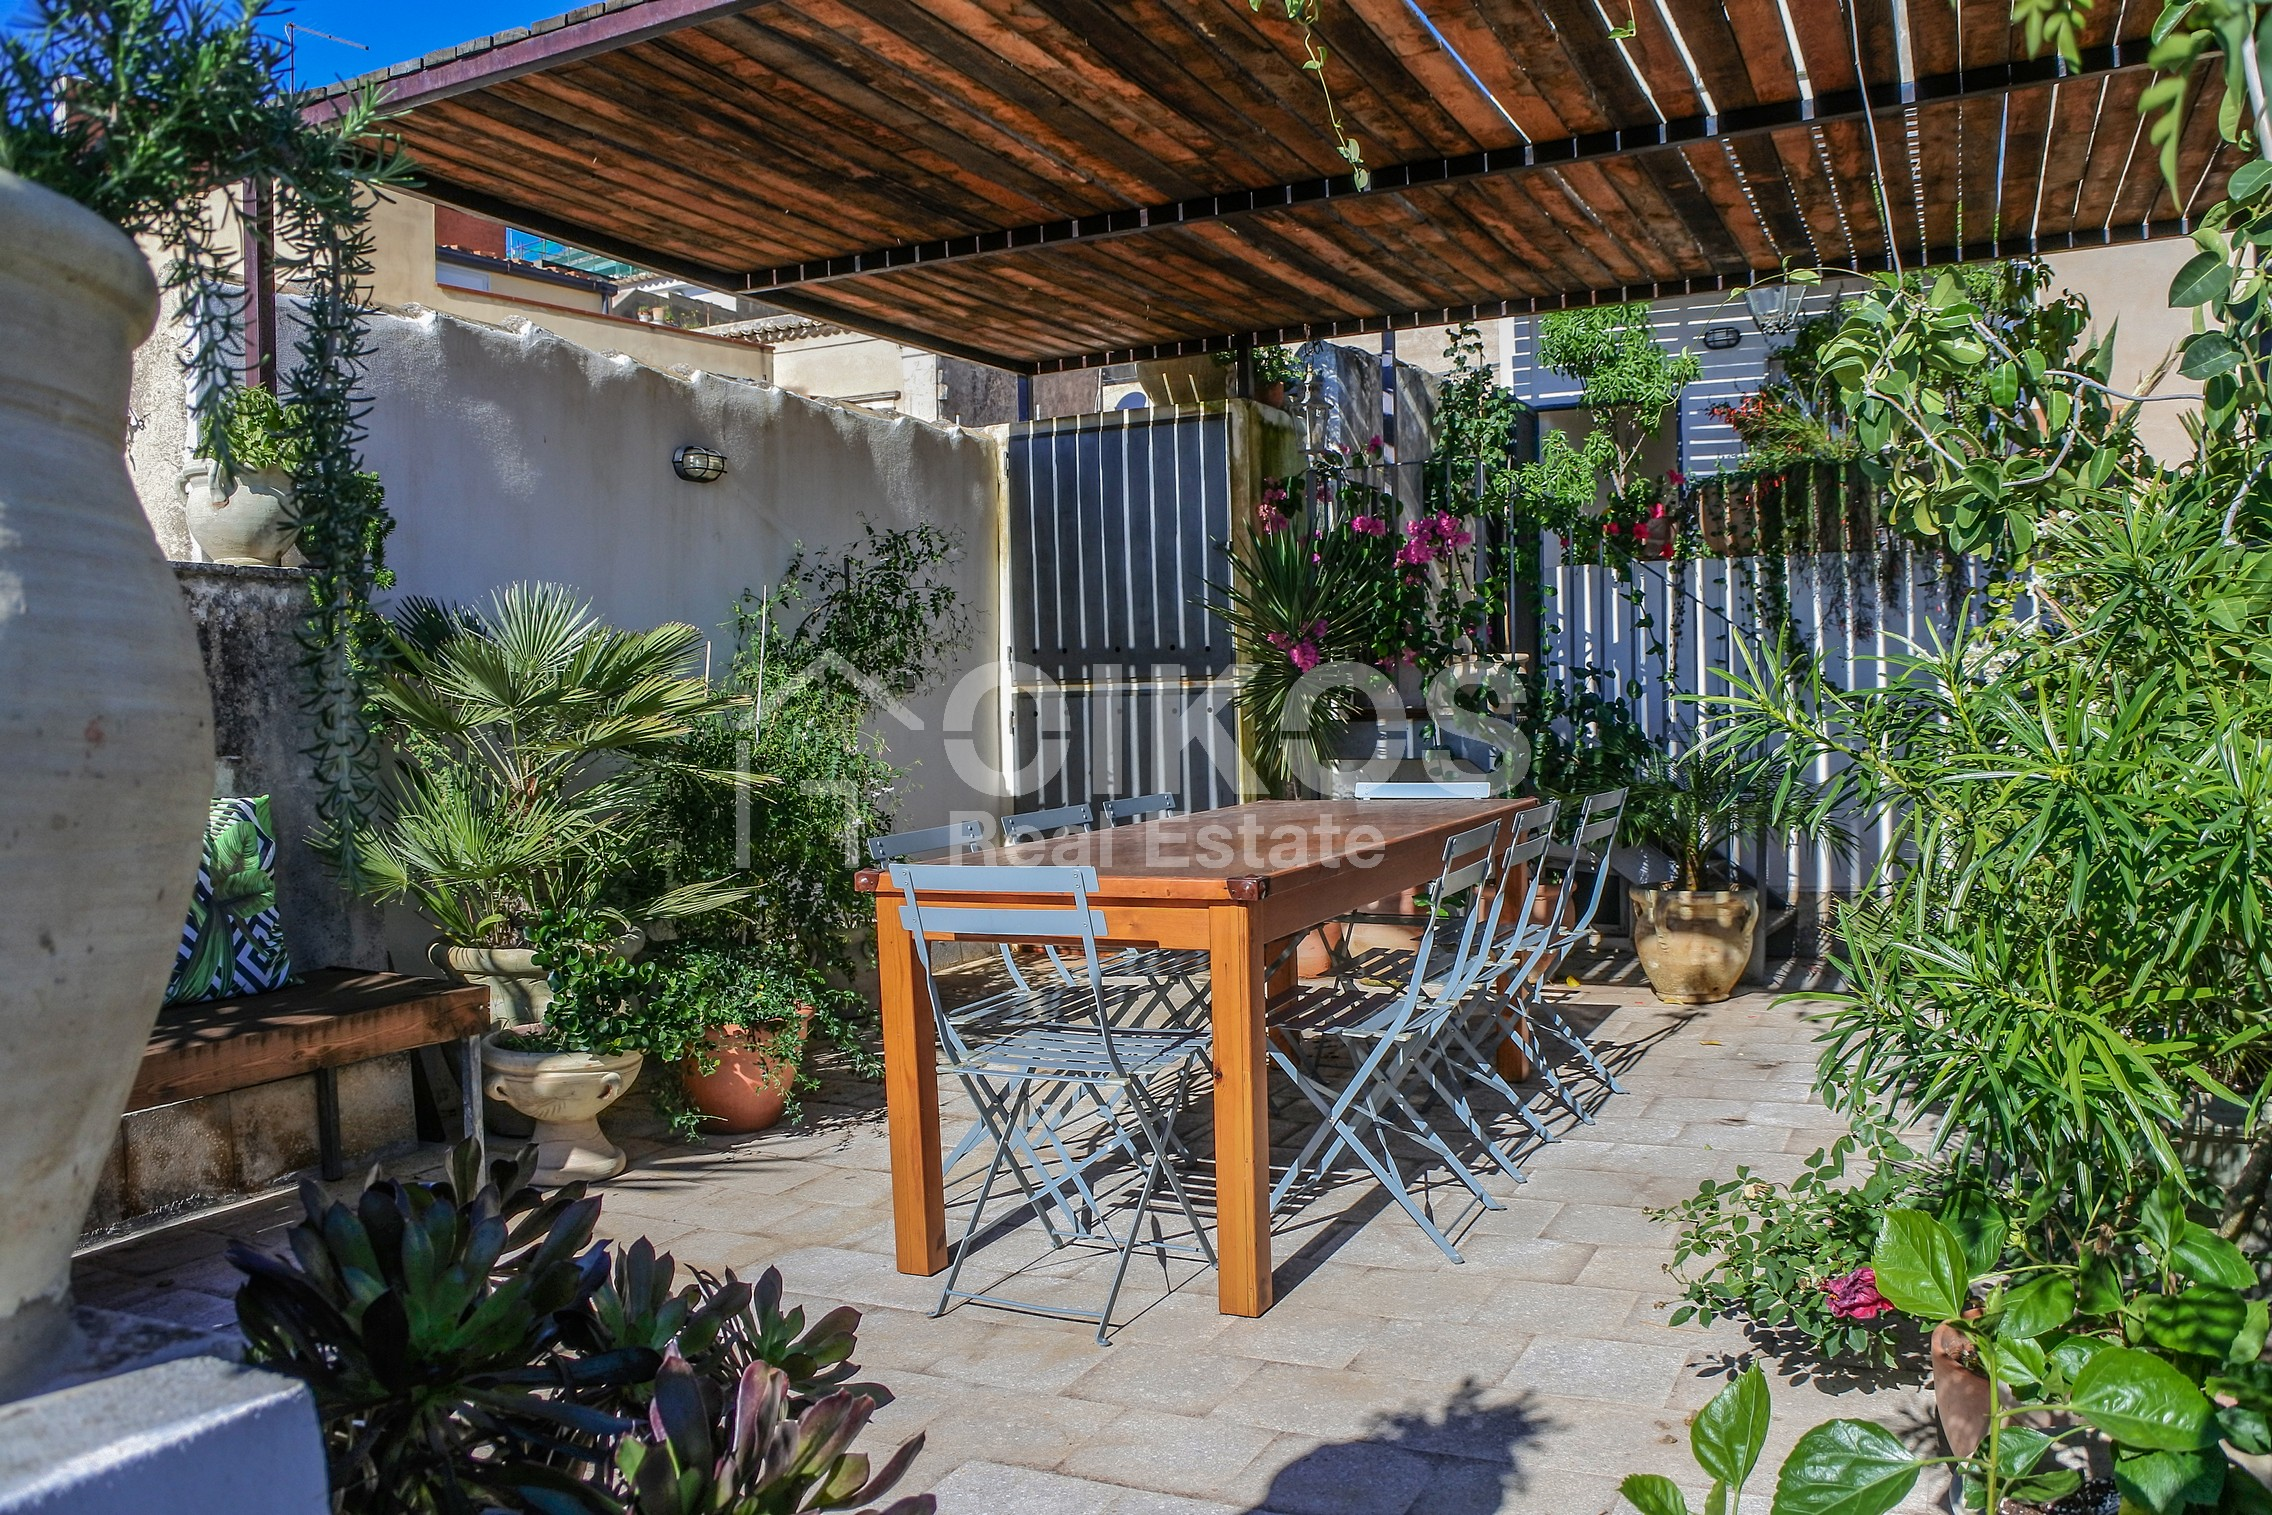 Terrazzi fioriti a mannarazze oikos real estate for Terrazzi fioriti